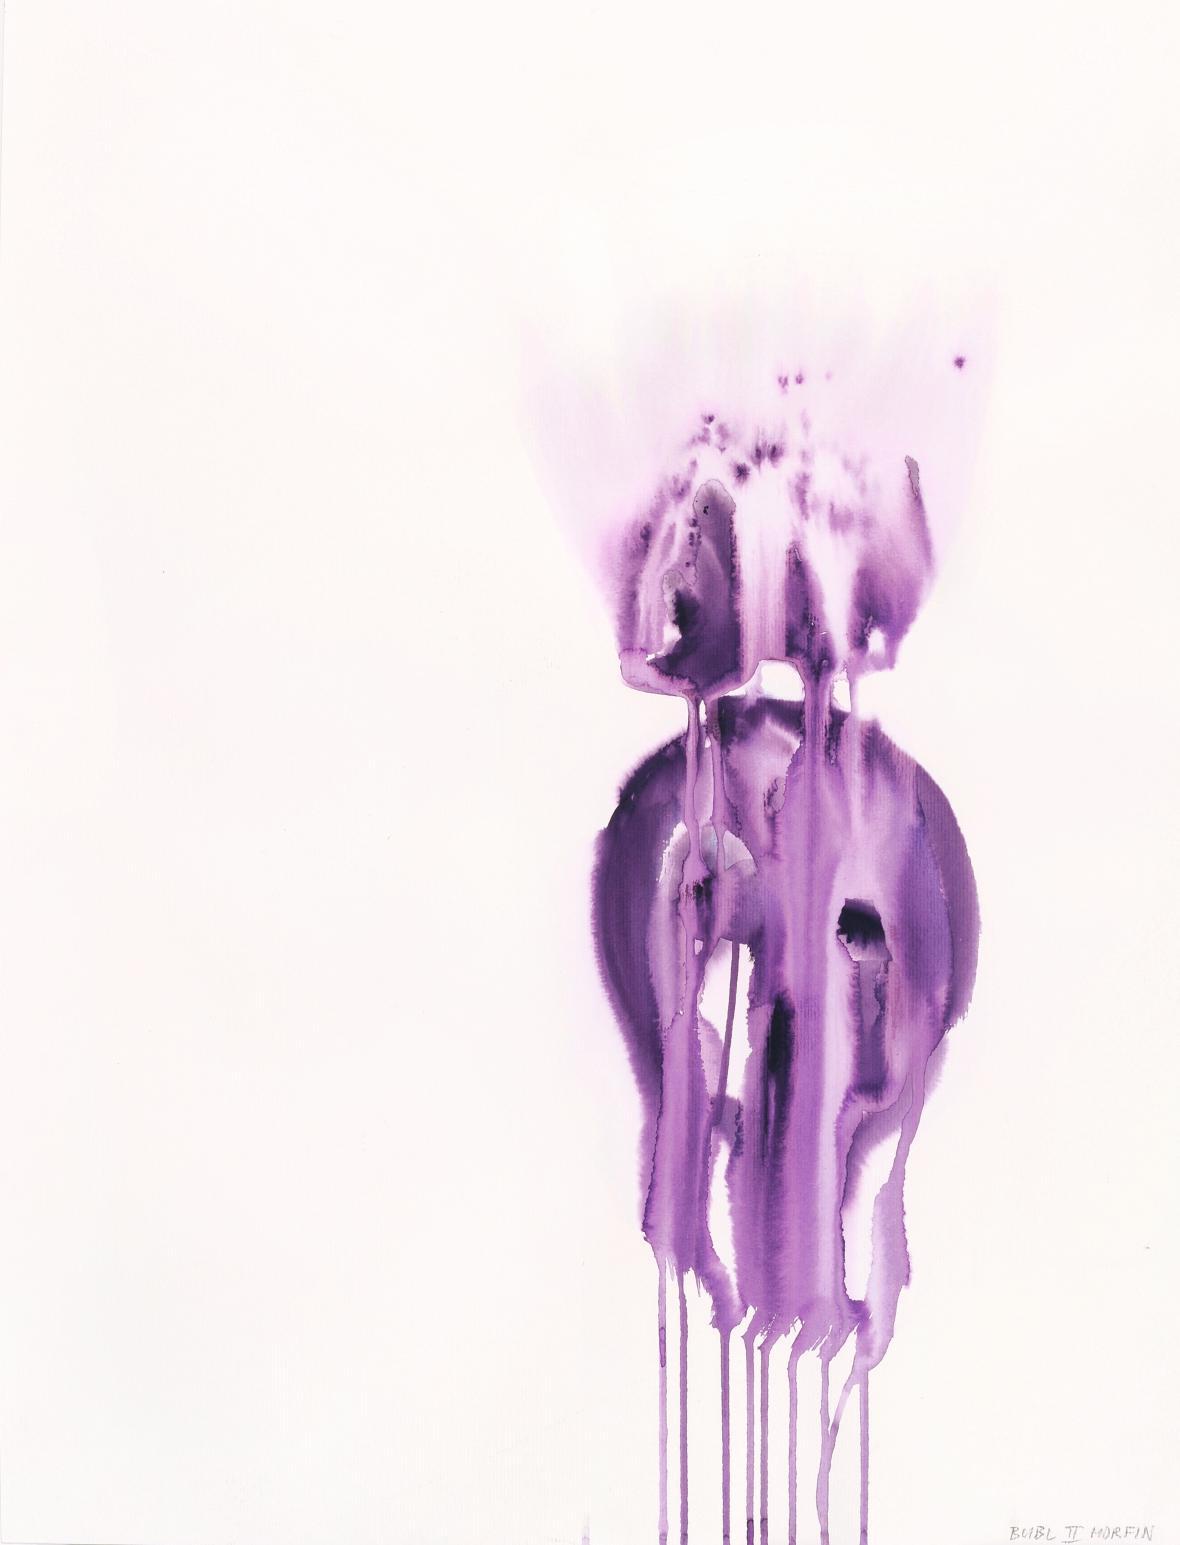 BII Morfin - Usínací, z cyklu Top 12 songs, 2010